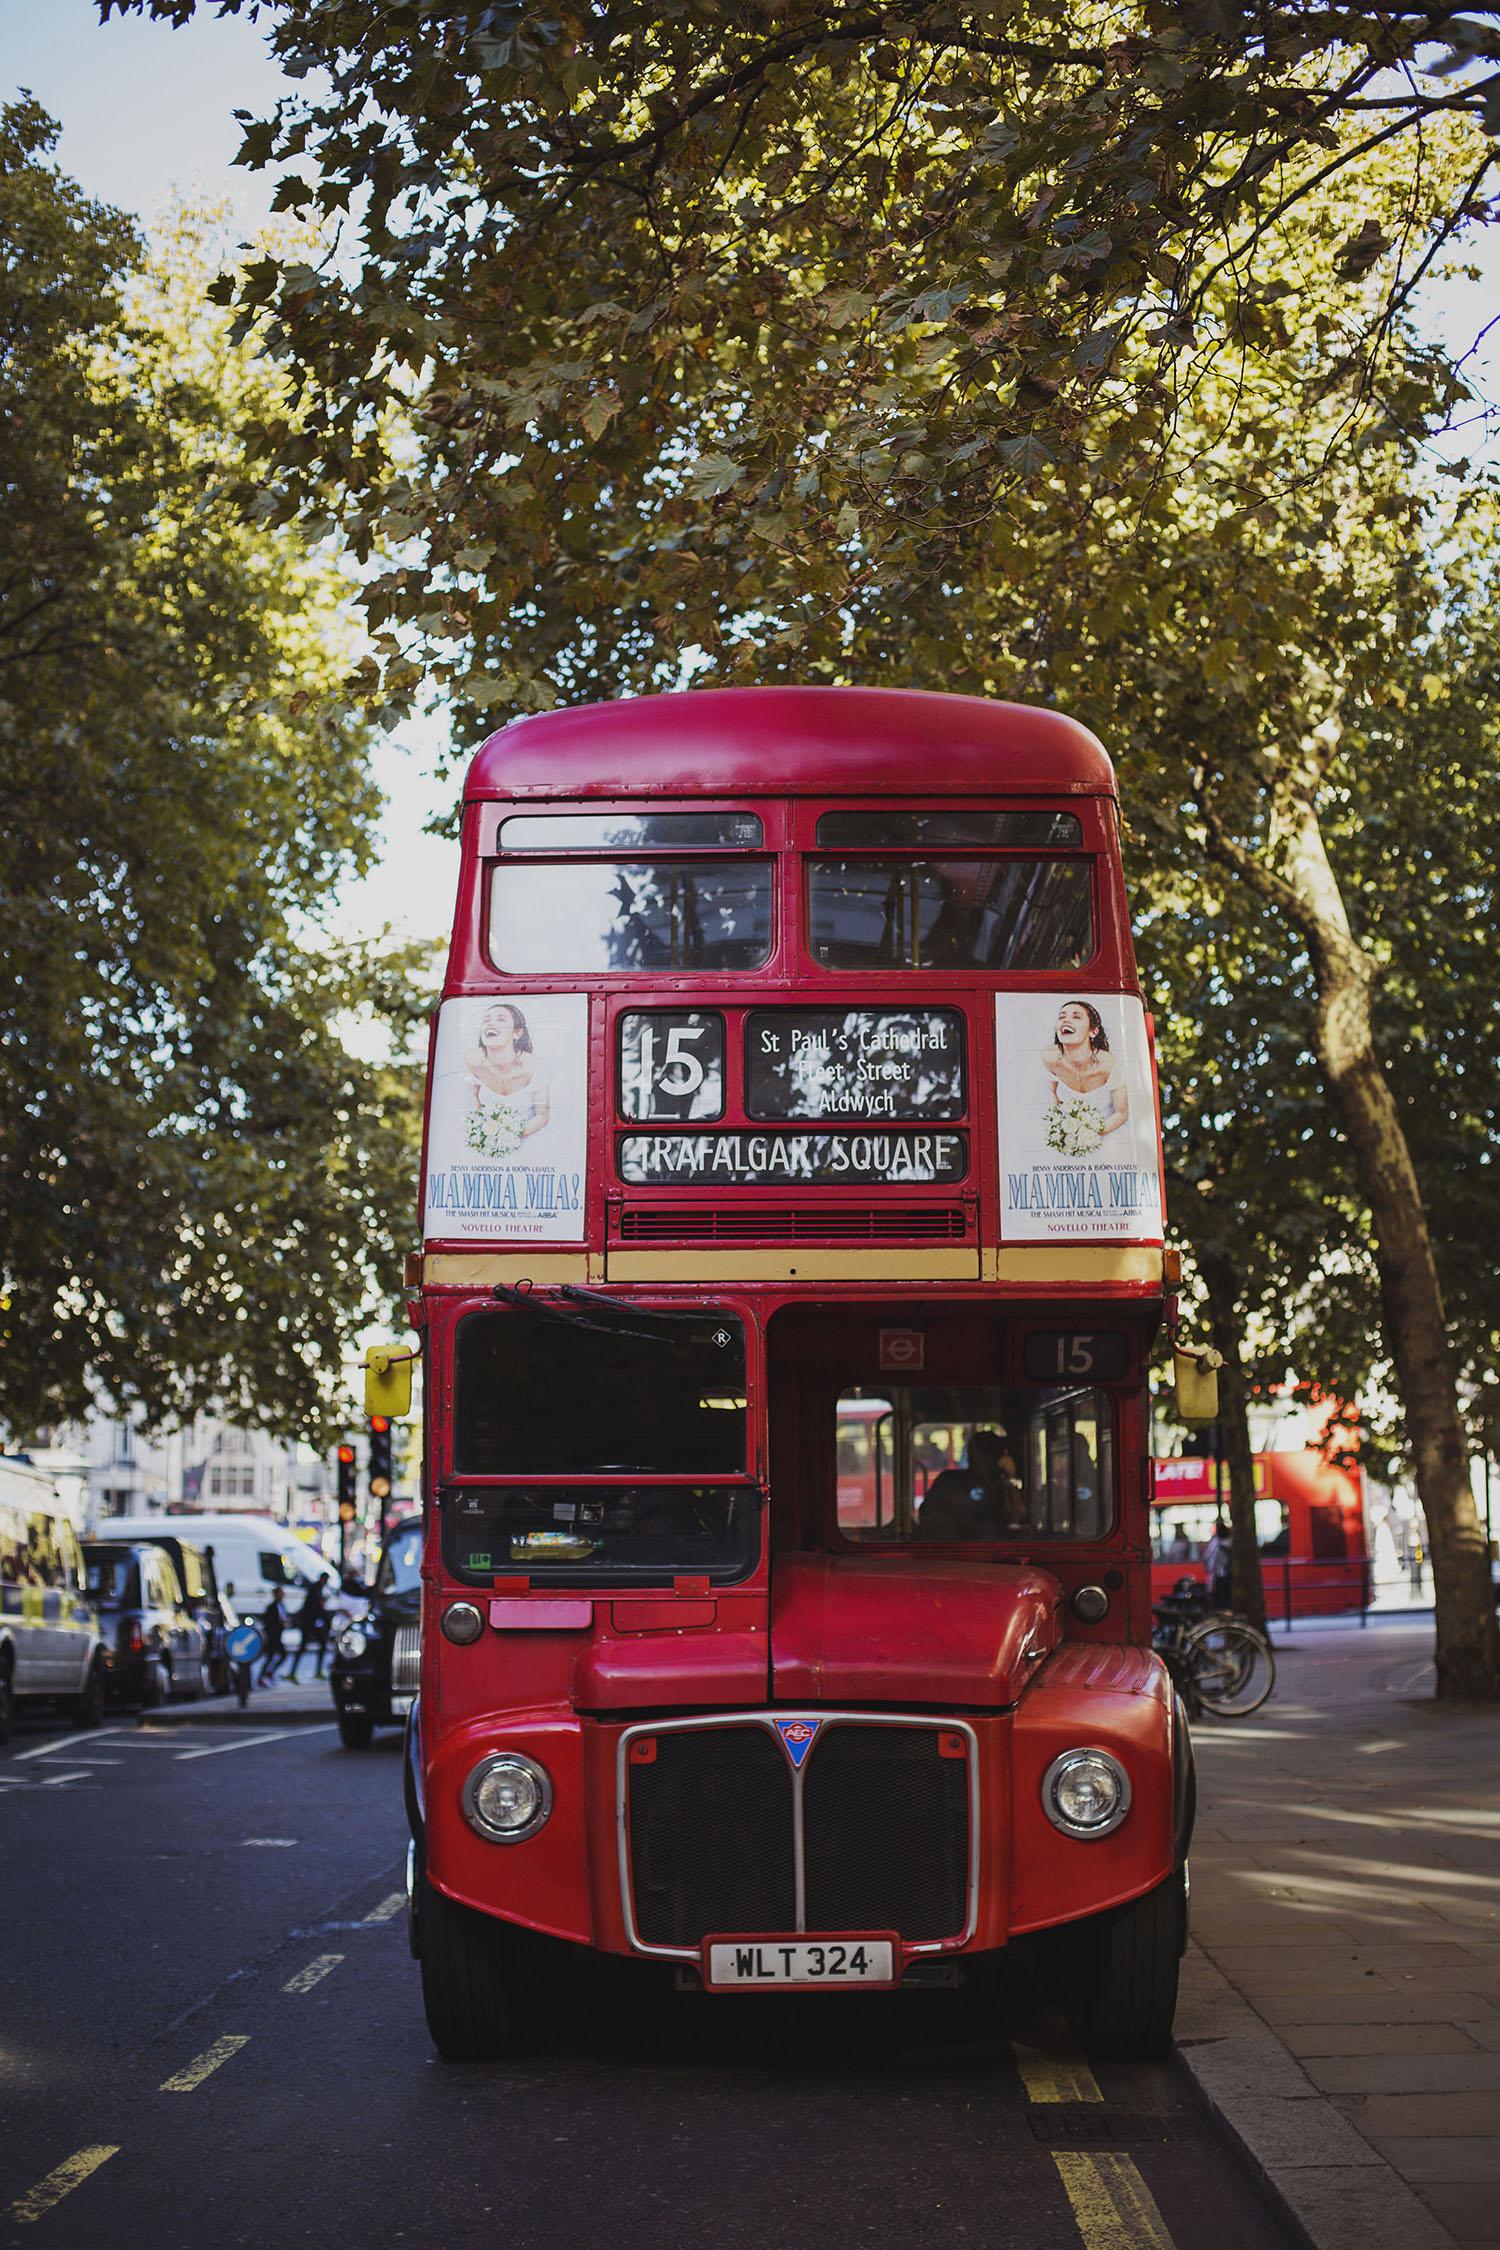 trafalgar square london red bus corinthia hotel wedding photographer